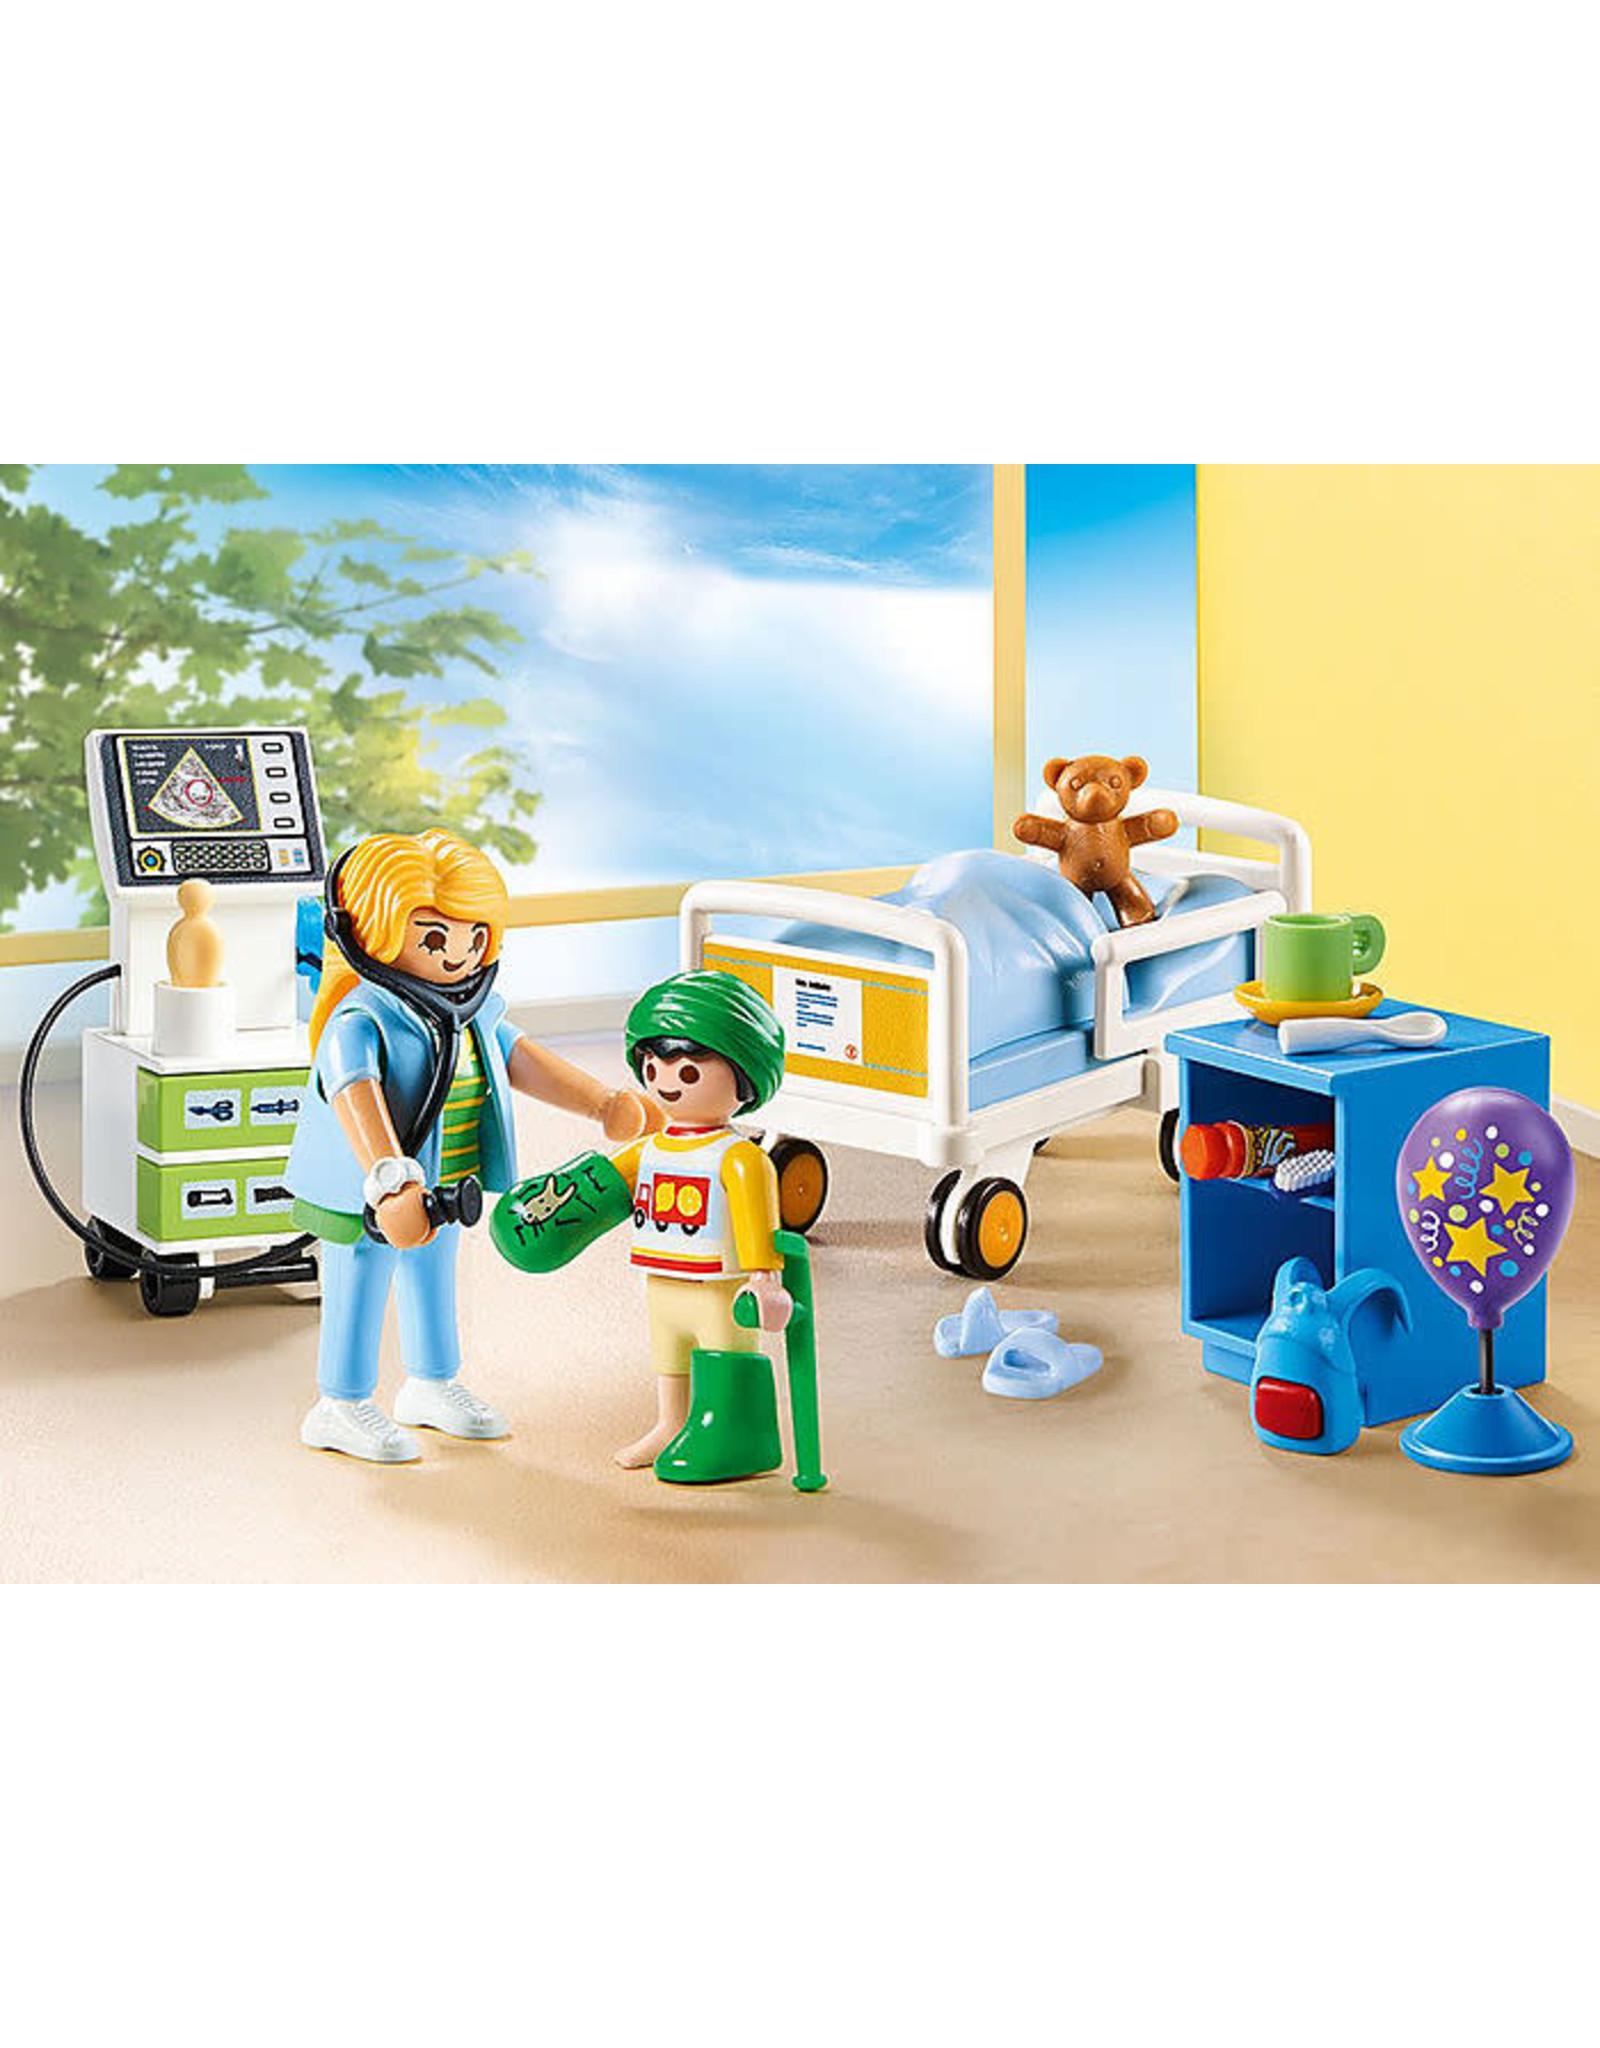 Playmobil Childrens Hospital Room